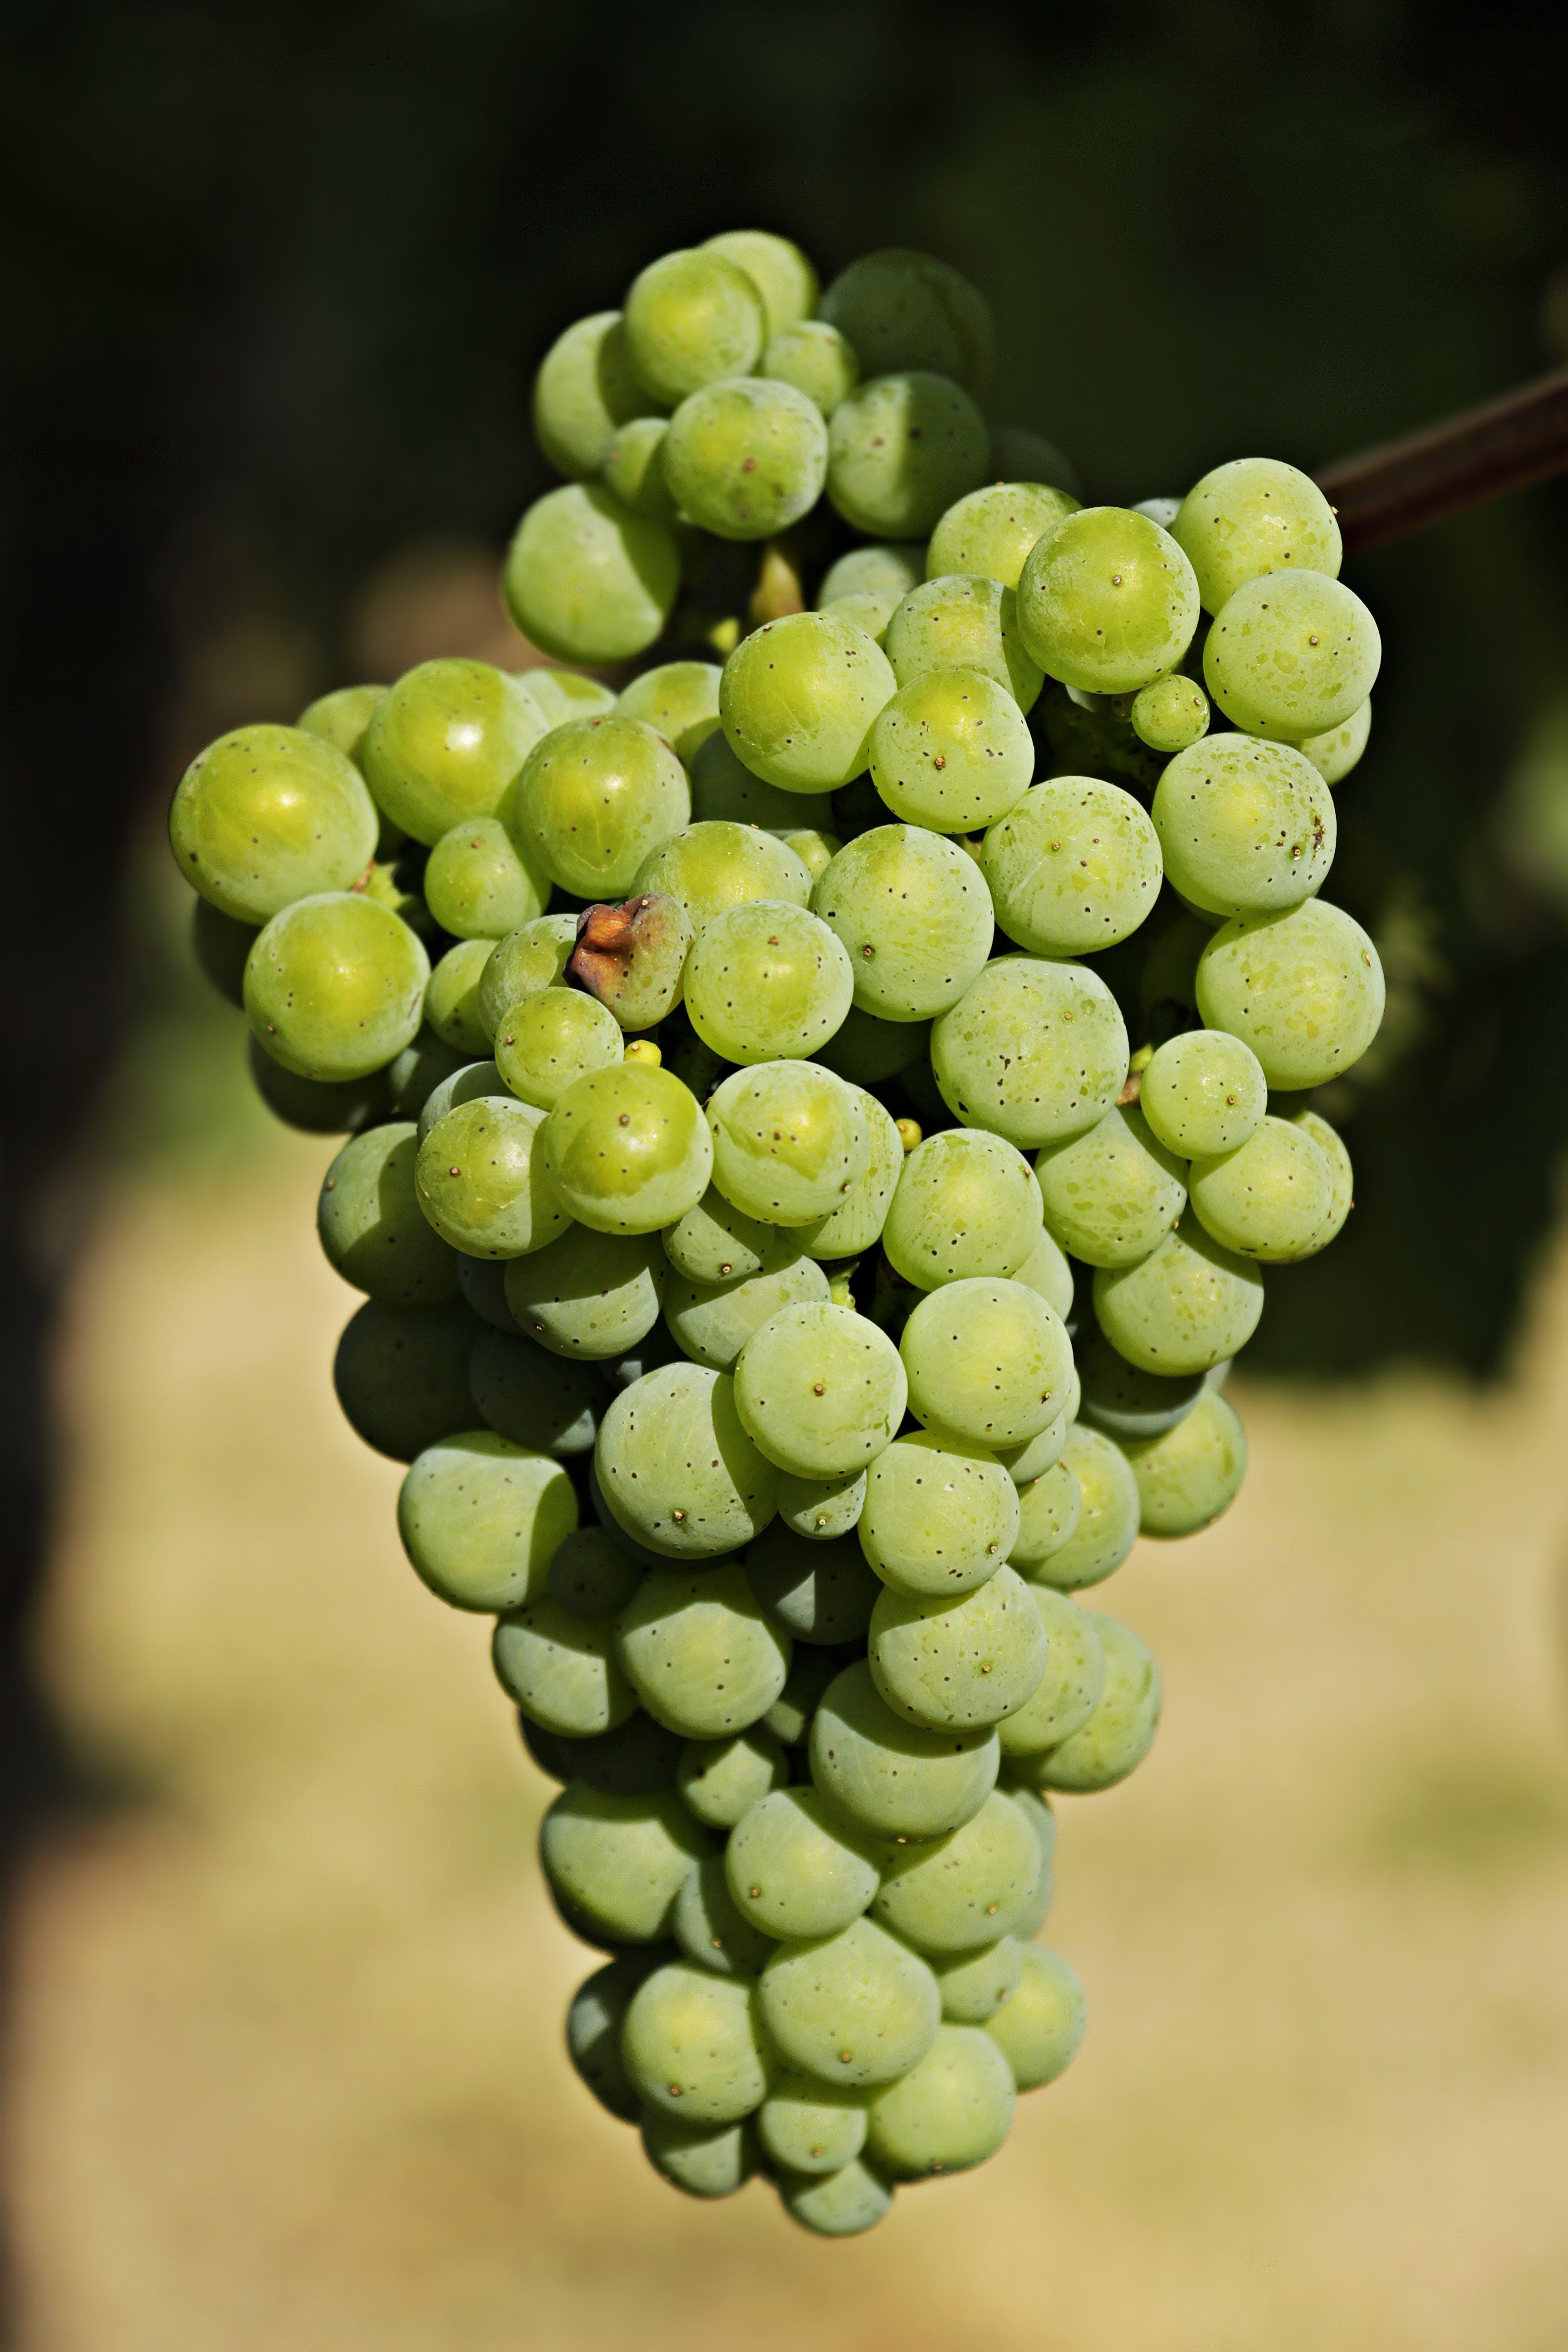 Bundle of Green Grapes